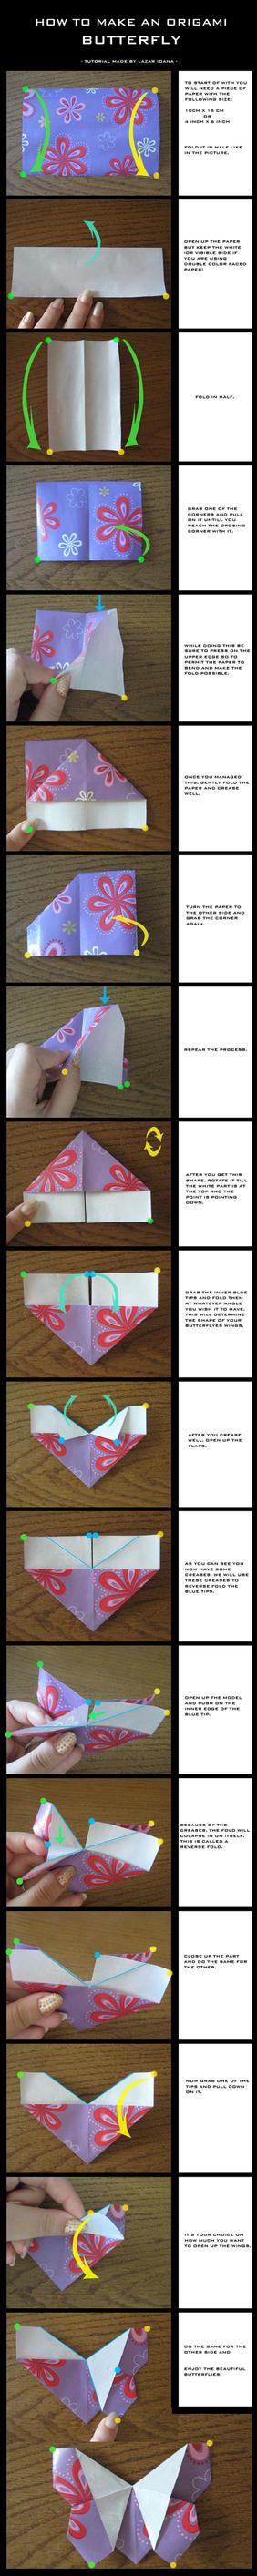 Tutorial: Origami Butterfly by DarkUmah